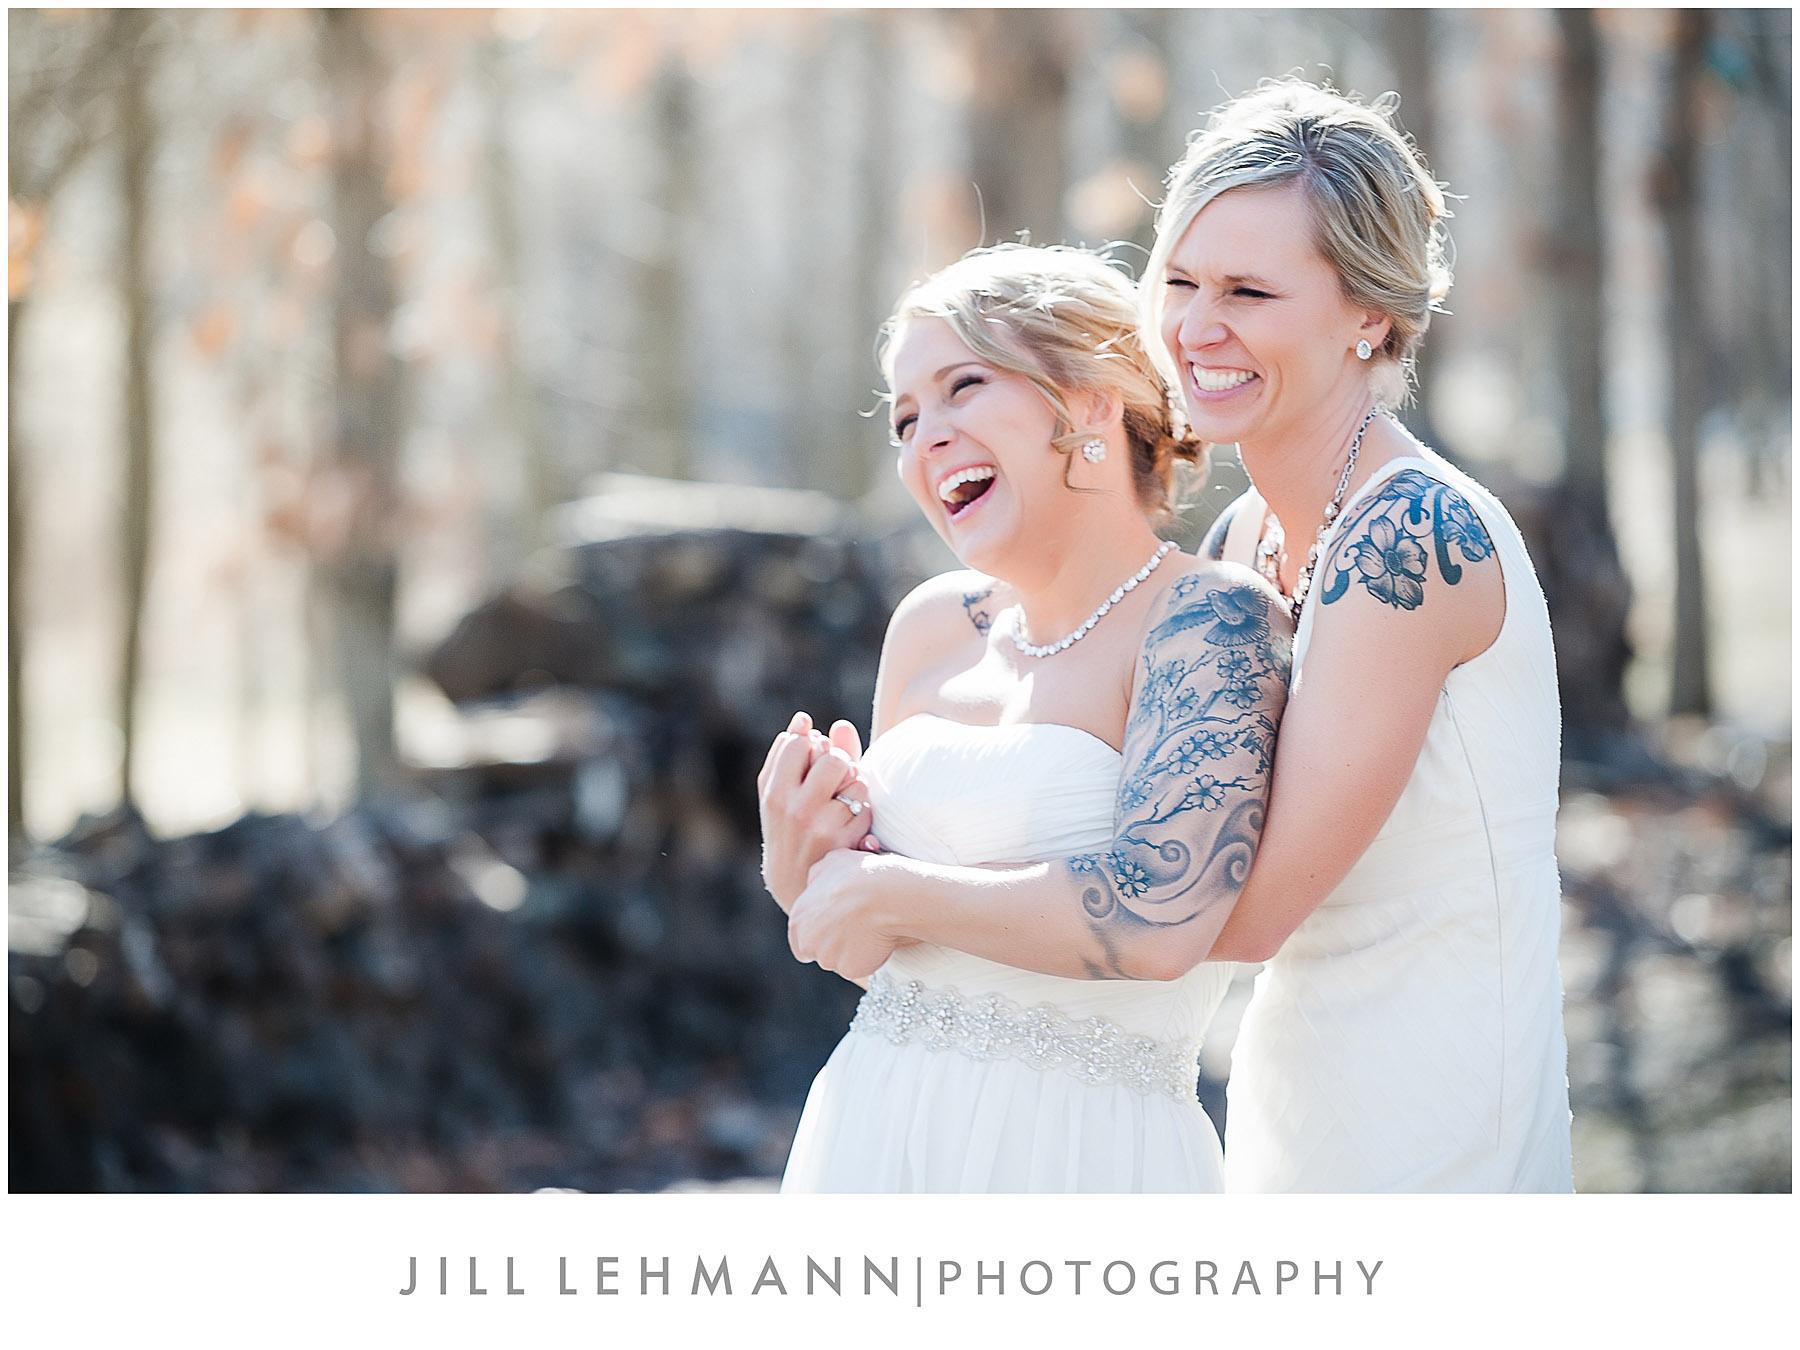 © Jill Lehmann Photography - Gay | Lesbian | Same-Sex Wedding Photography in Des Moines, IA